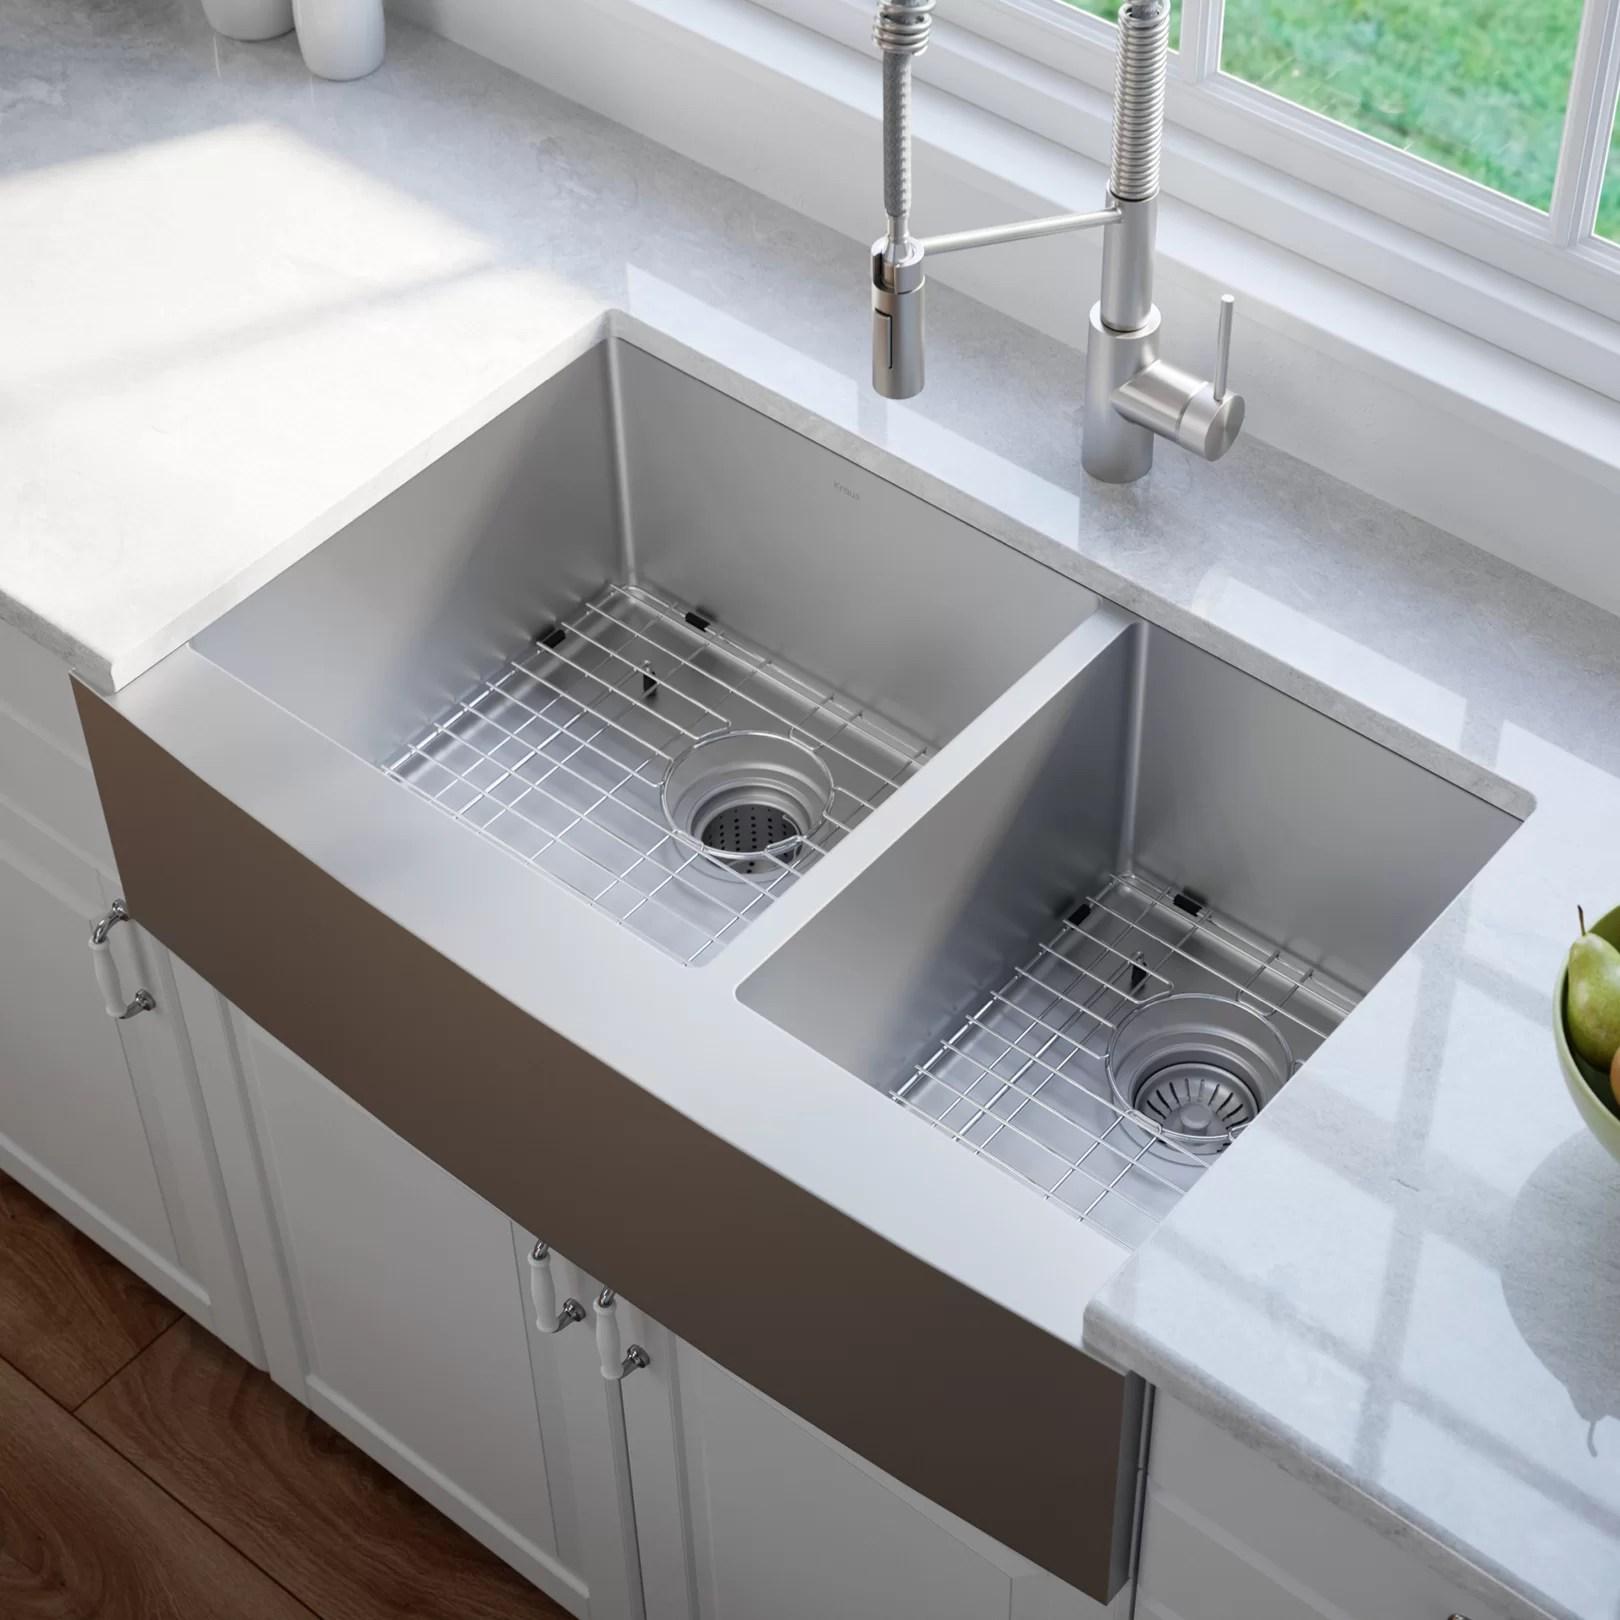 33 l x 21 w double basin farmhouse kitchen sink with basket strainer